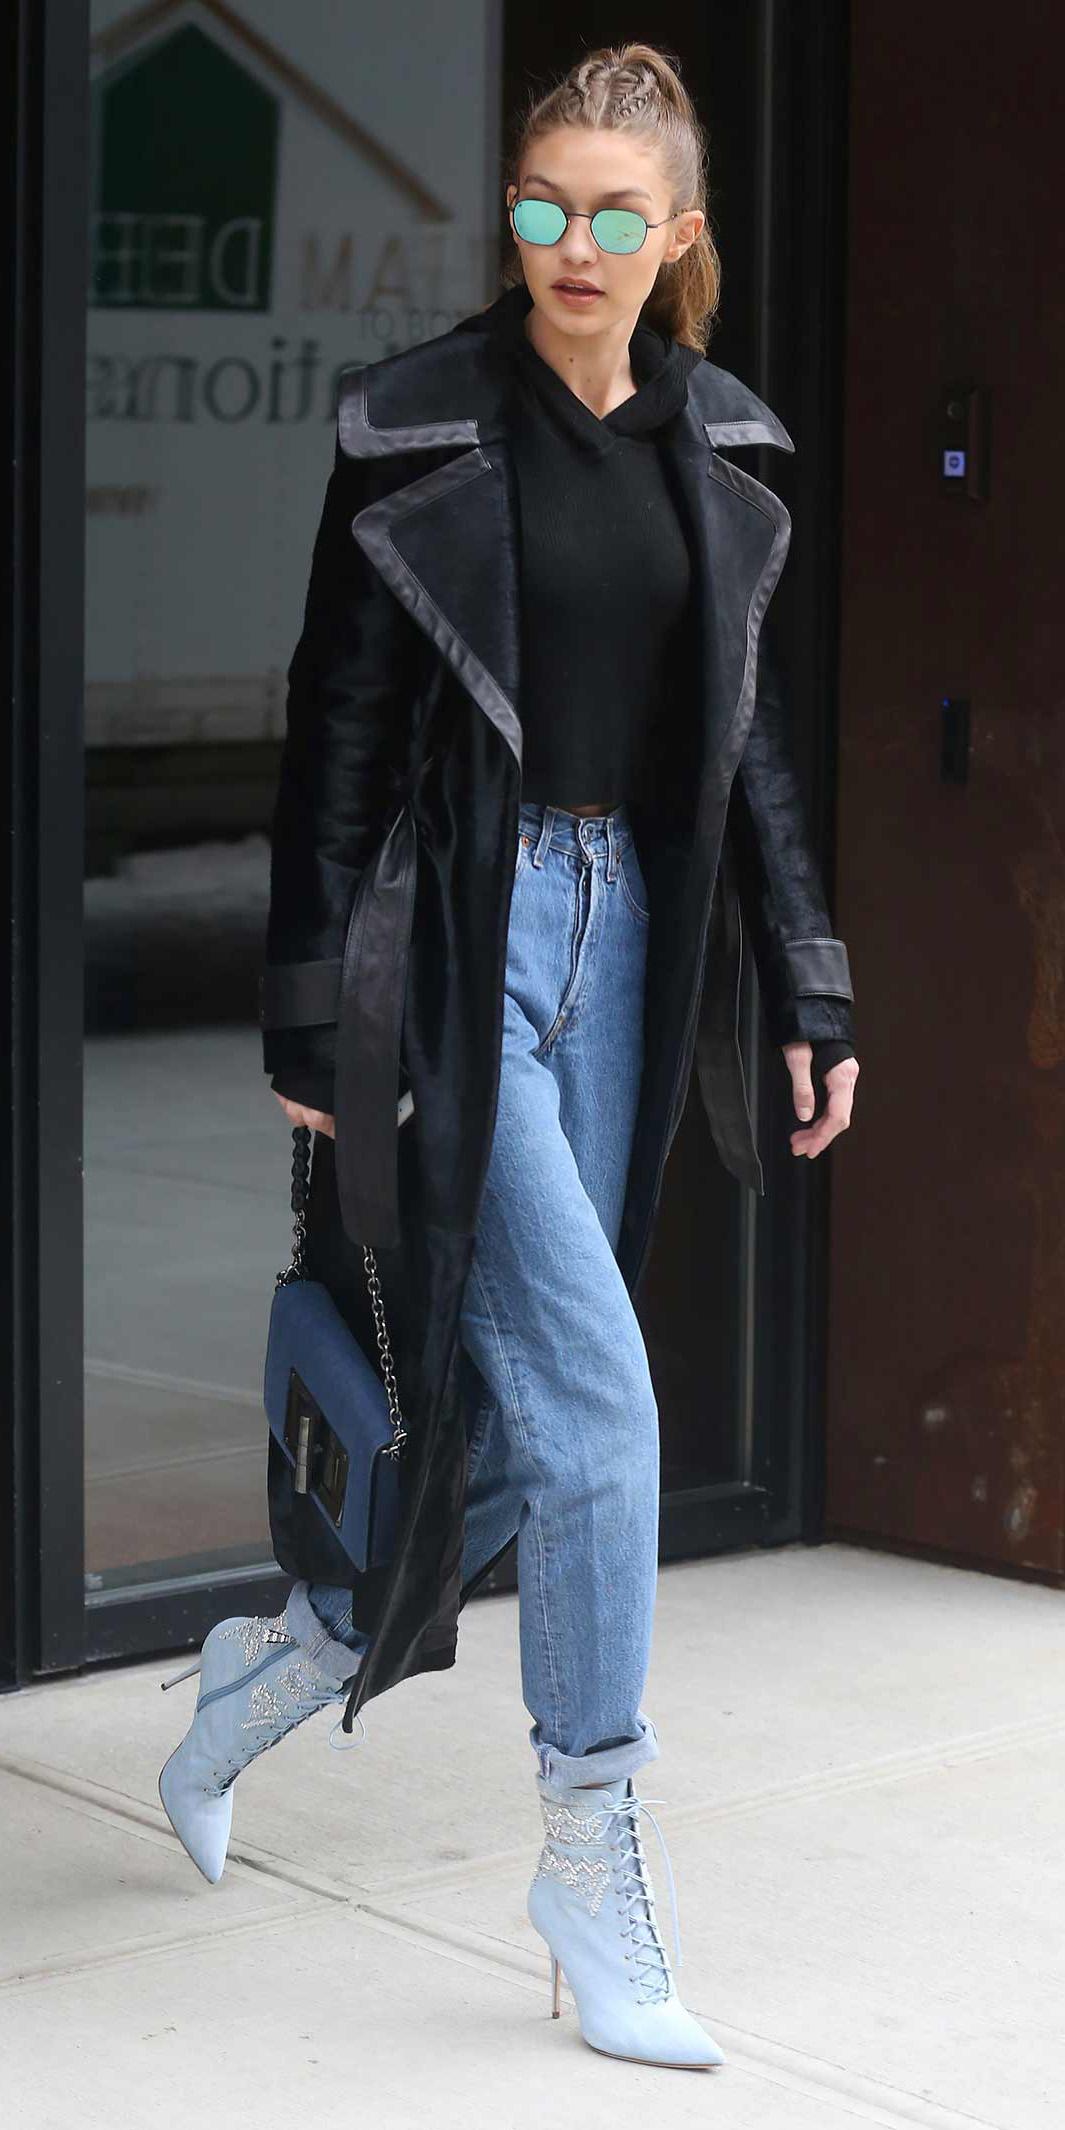 blue-light-boyfriend-jeans-blue-shoe-booties-sun-pony-blue-bag-black-sweater-sweatshirt-gigihadid-trench-black-jacket-coat-fall-winter-blonde-lunch.jpg